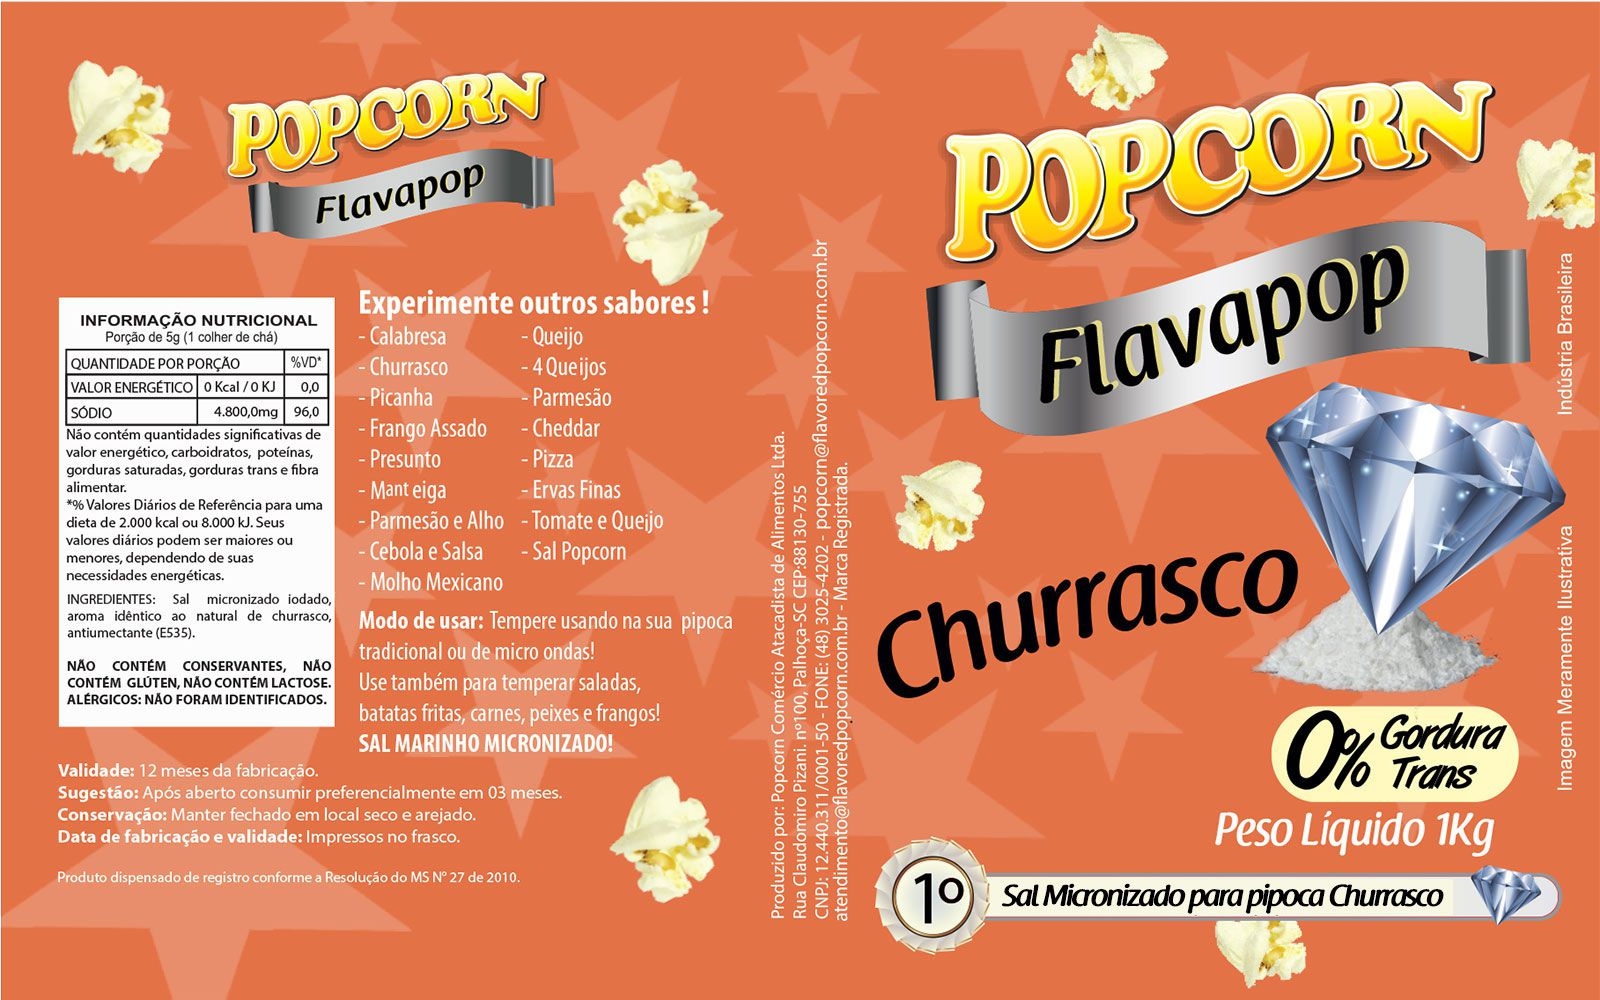 FLAVAPOP - Original de cinema -  Churrasco - Micronizado Popcorn  - Pct 1kg